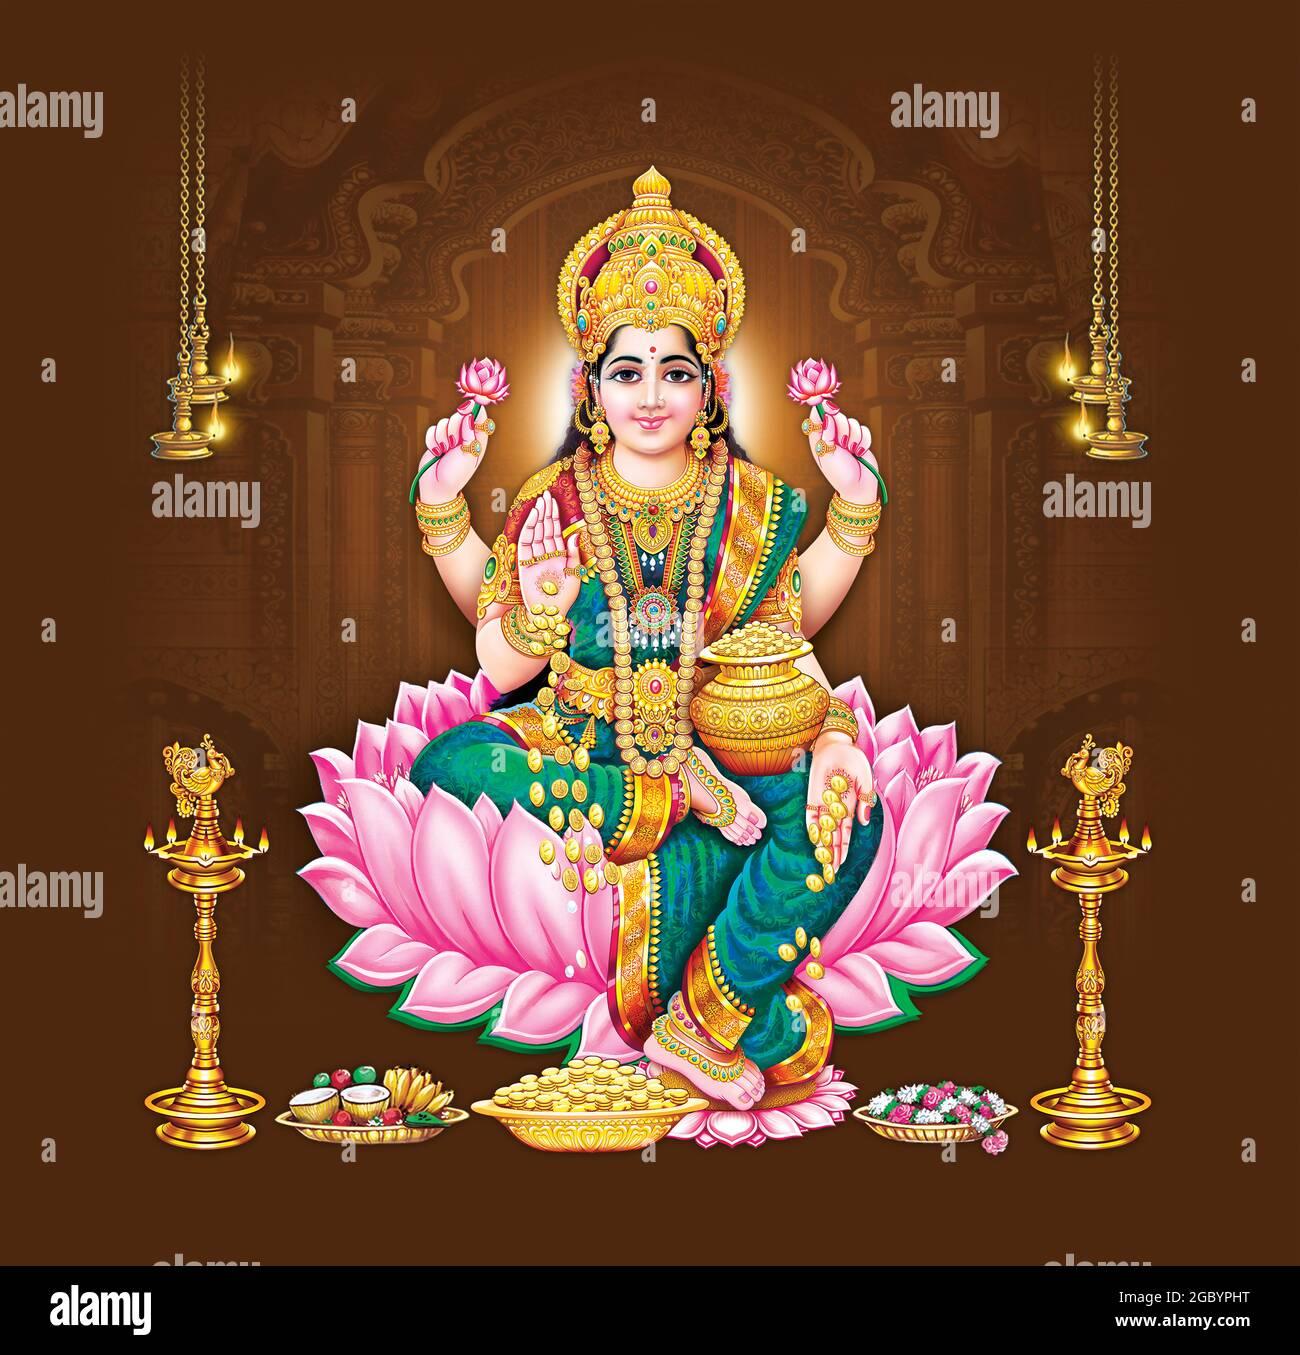 Trending New Hindu God Lakshmi Sitzen Bei Lotus Schone Malerei Kunst Stockfotografie Alamy